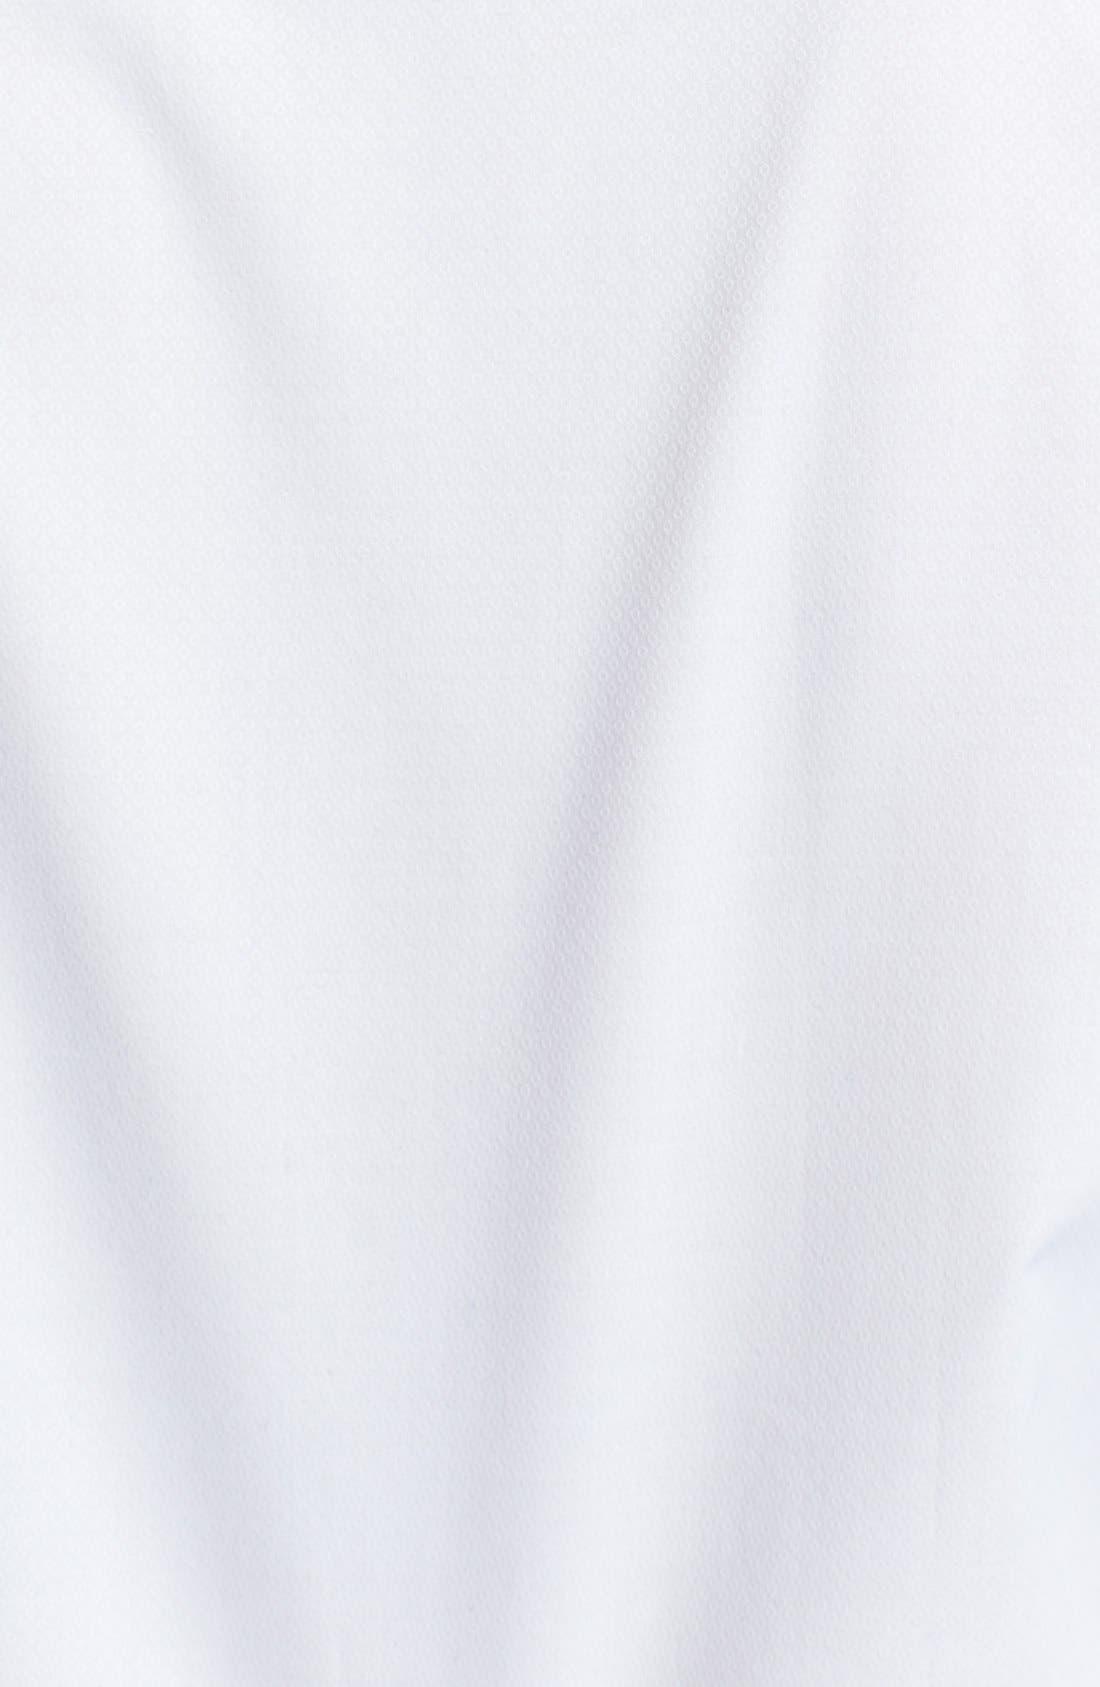 Alternate Image 3  - Z Zegna Drop 8 Fit Tonal Diamond Print Dress Shirt